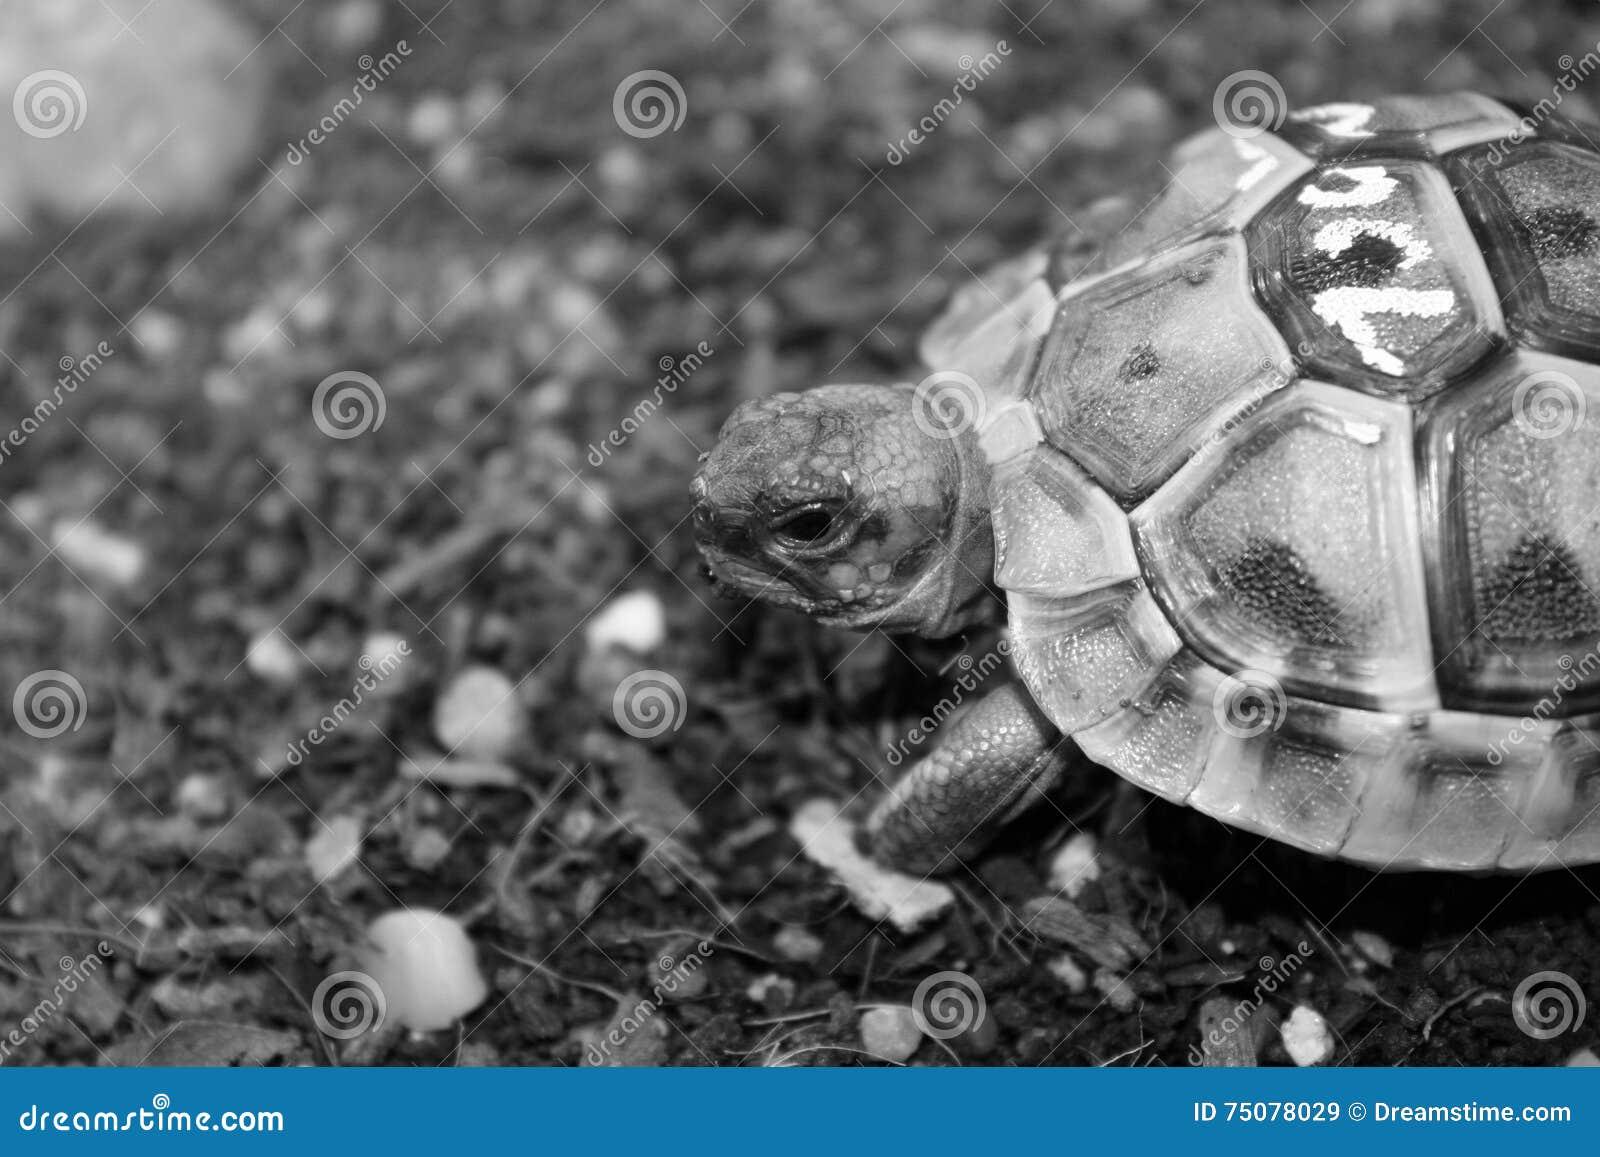 Turtle Terrarium Small Pet Animal Raptiles Tropical Stock Image